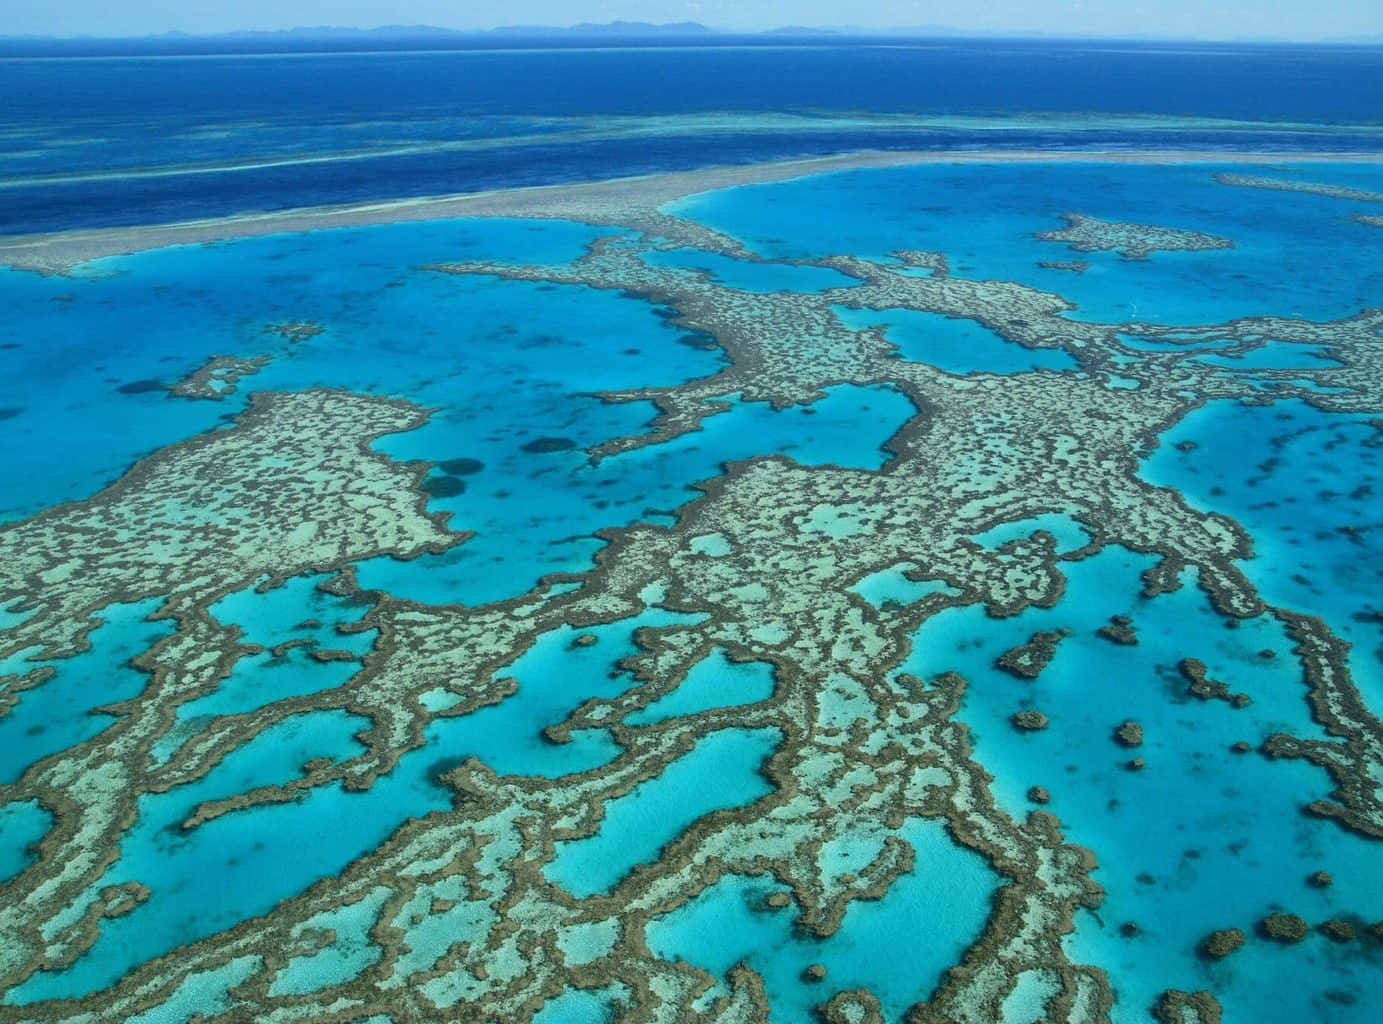 Oceania, Australia & New Zealand Travel - blue coral waters shot